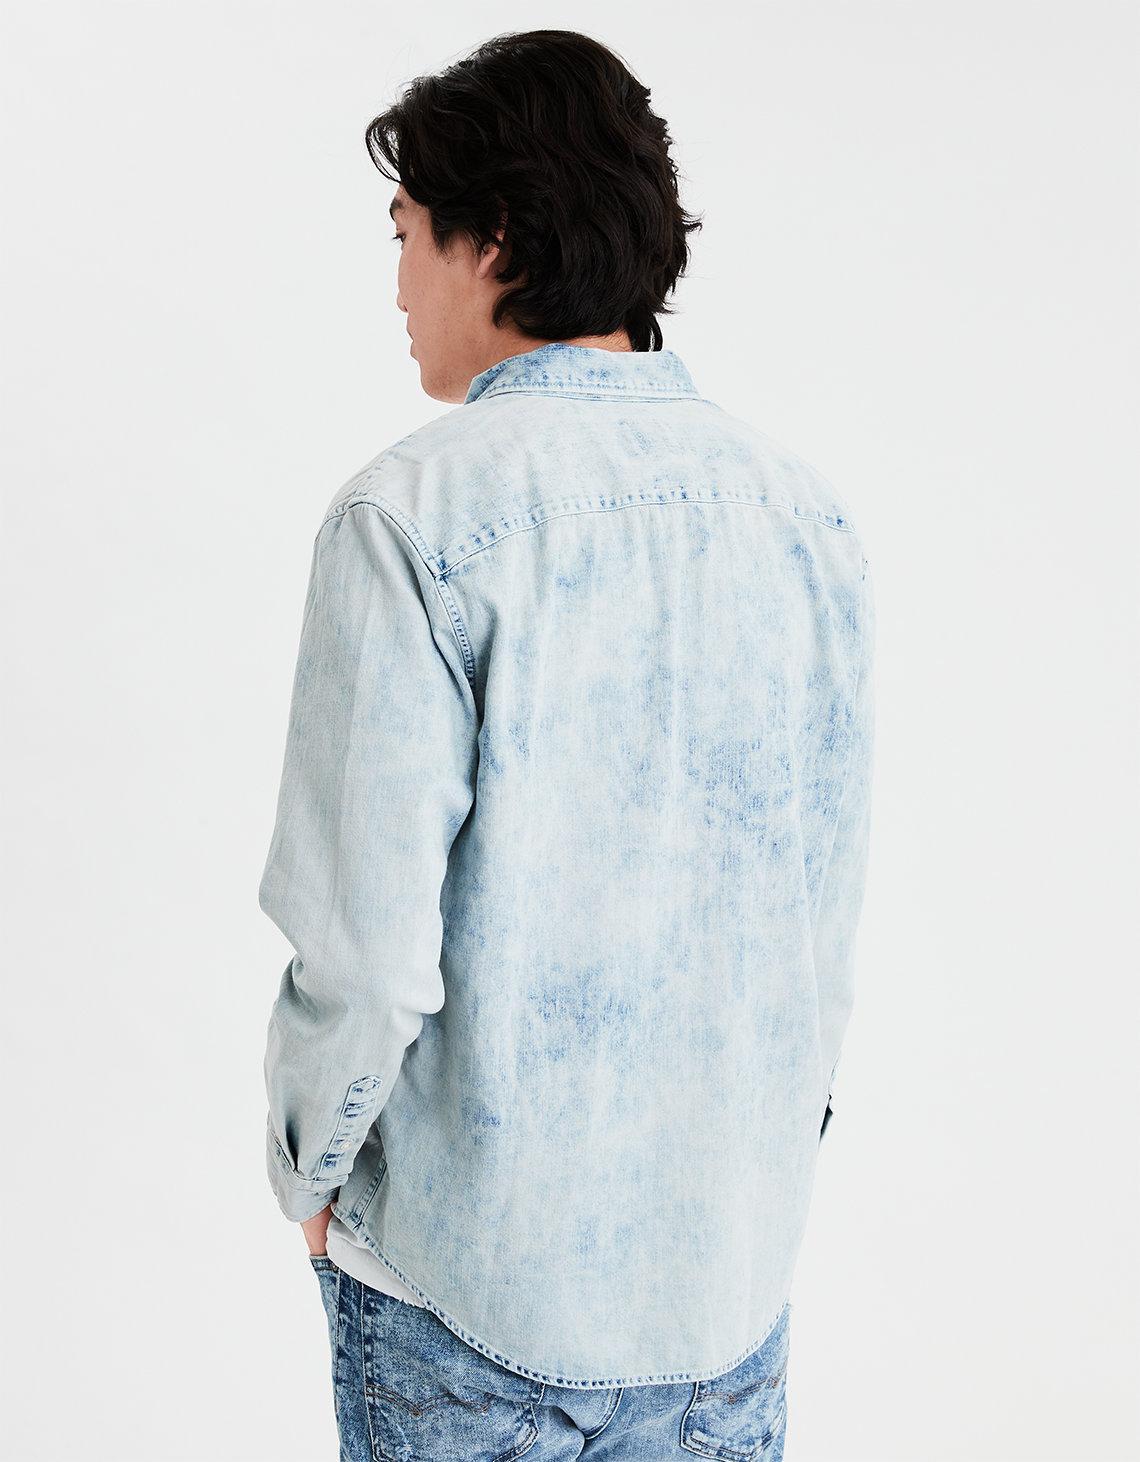 dfe4a4d6146 Lyst - American Eagle Ae Long Sleeve Acid Wash Denim Button Down Shirt in  Blue for Men